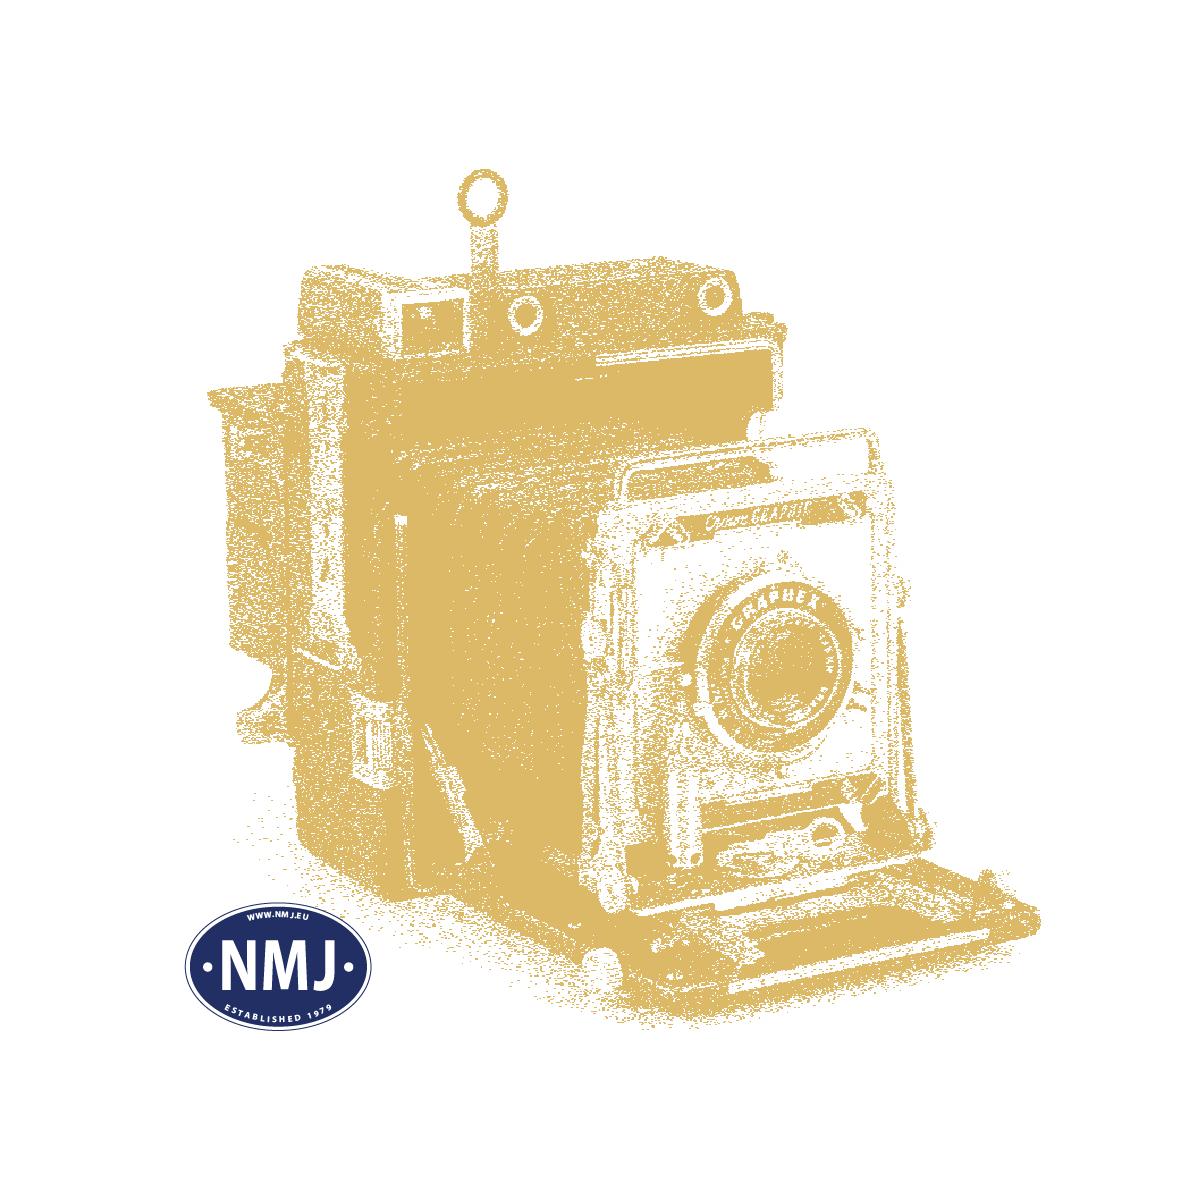 NMJT110.102 - NMJ Topline NSB BR 21201, Rotbraun